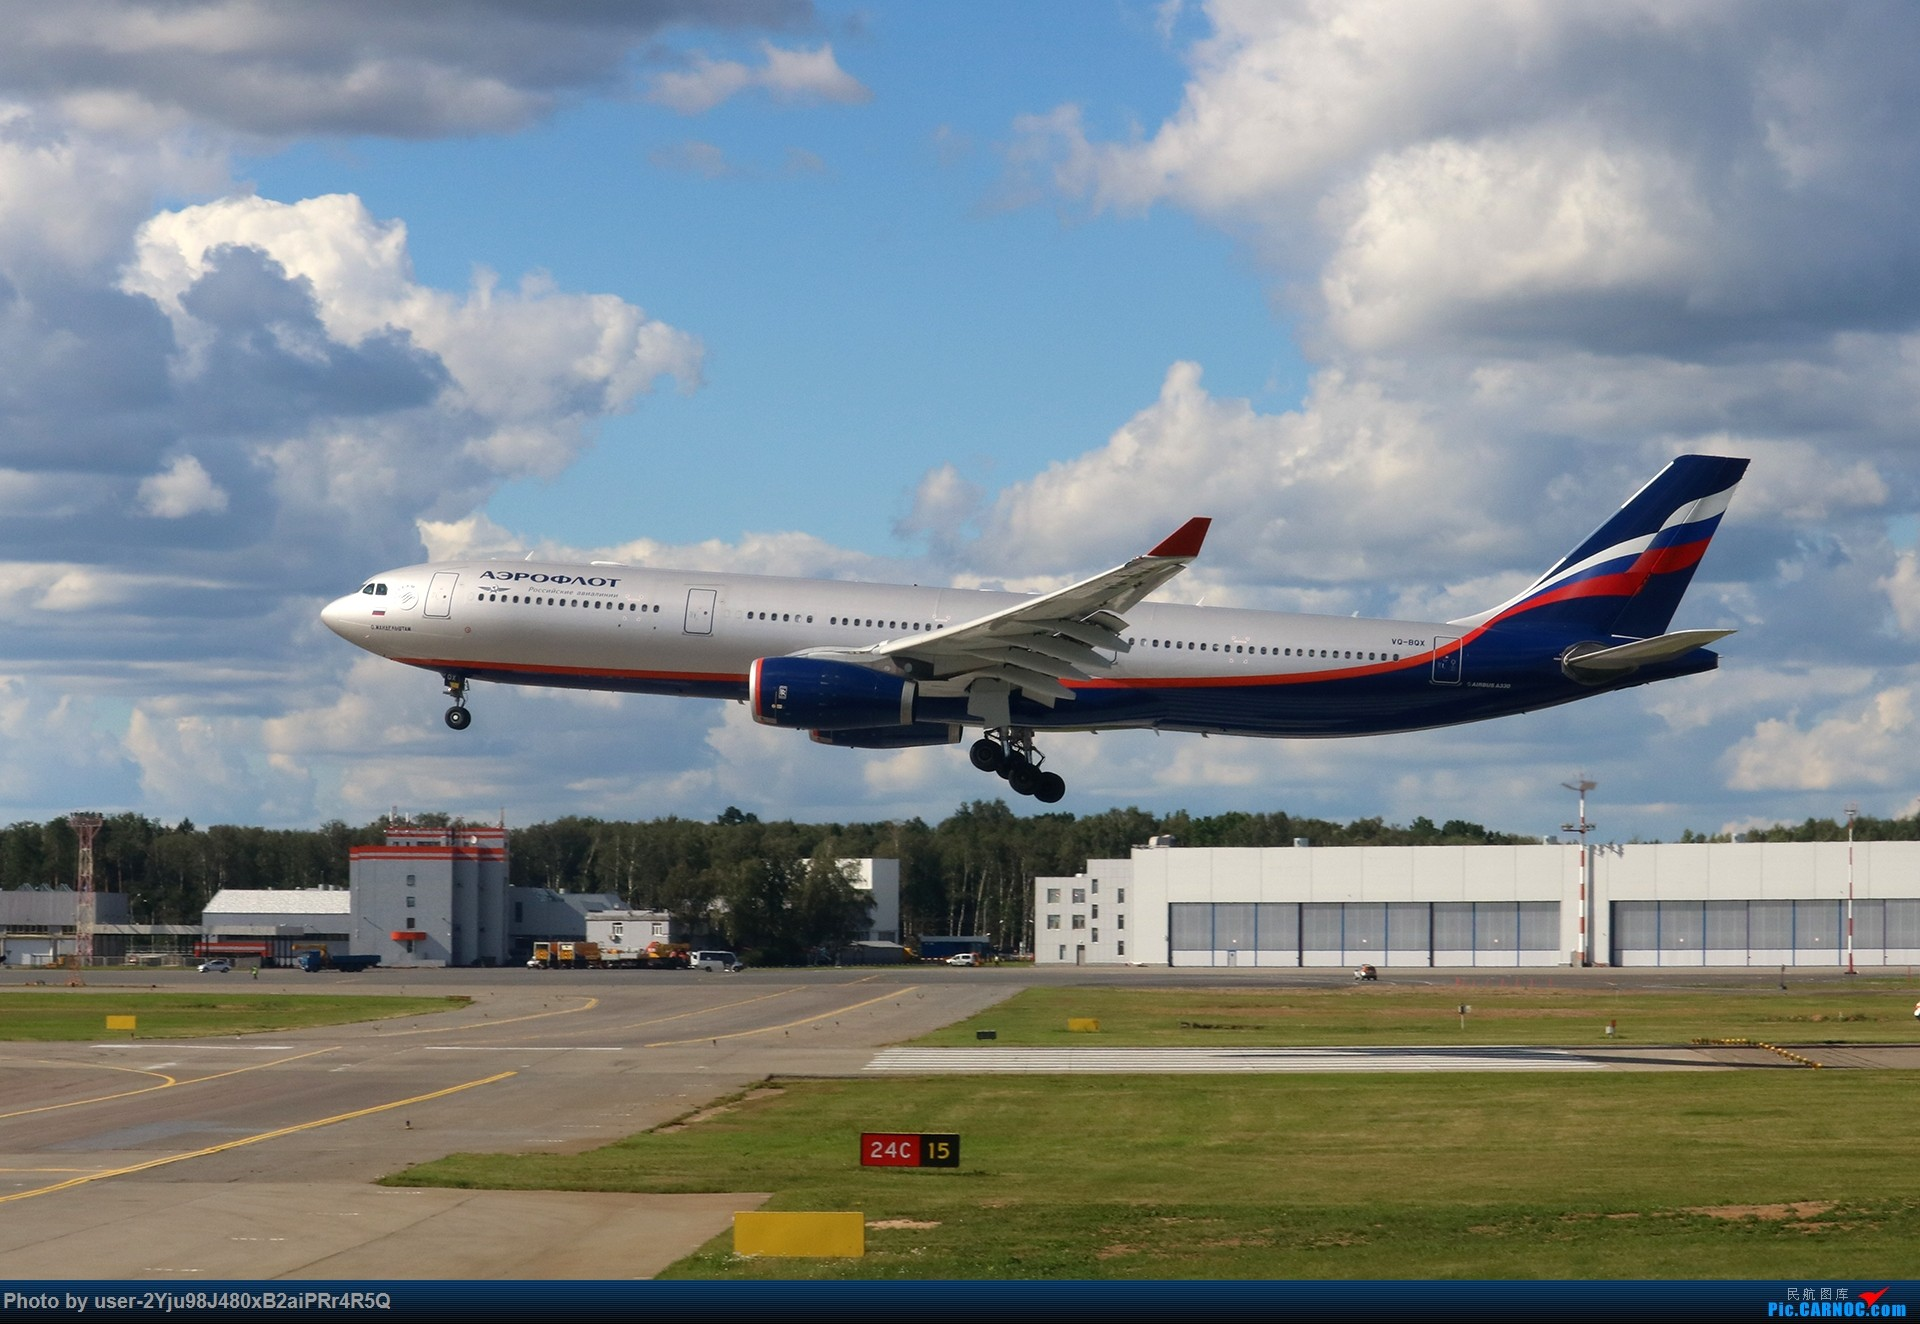 Re:[原创]LIULIU Sheremetyevo的漫游 Aeroflot毛航篇 AIRBUS A330-343 VQ-BQX 俄罗斯谢诺梅杰沃机场